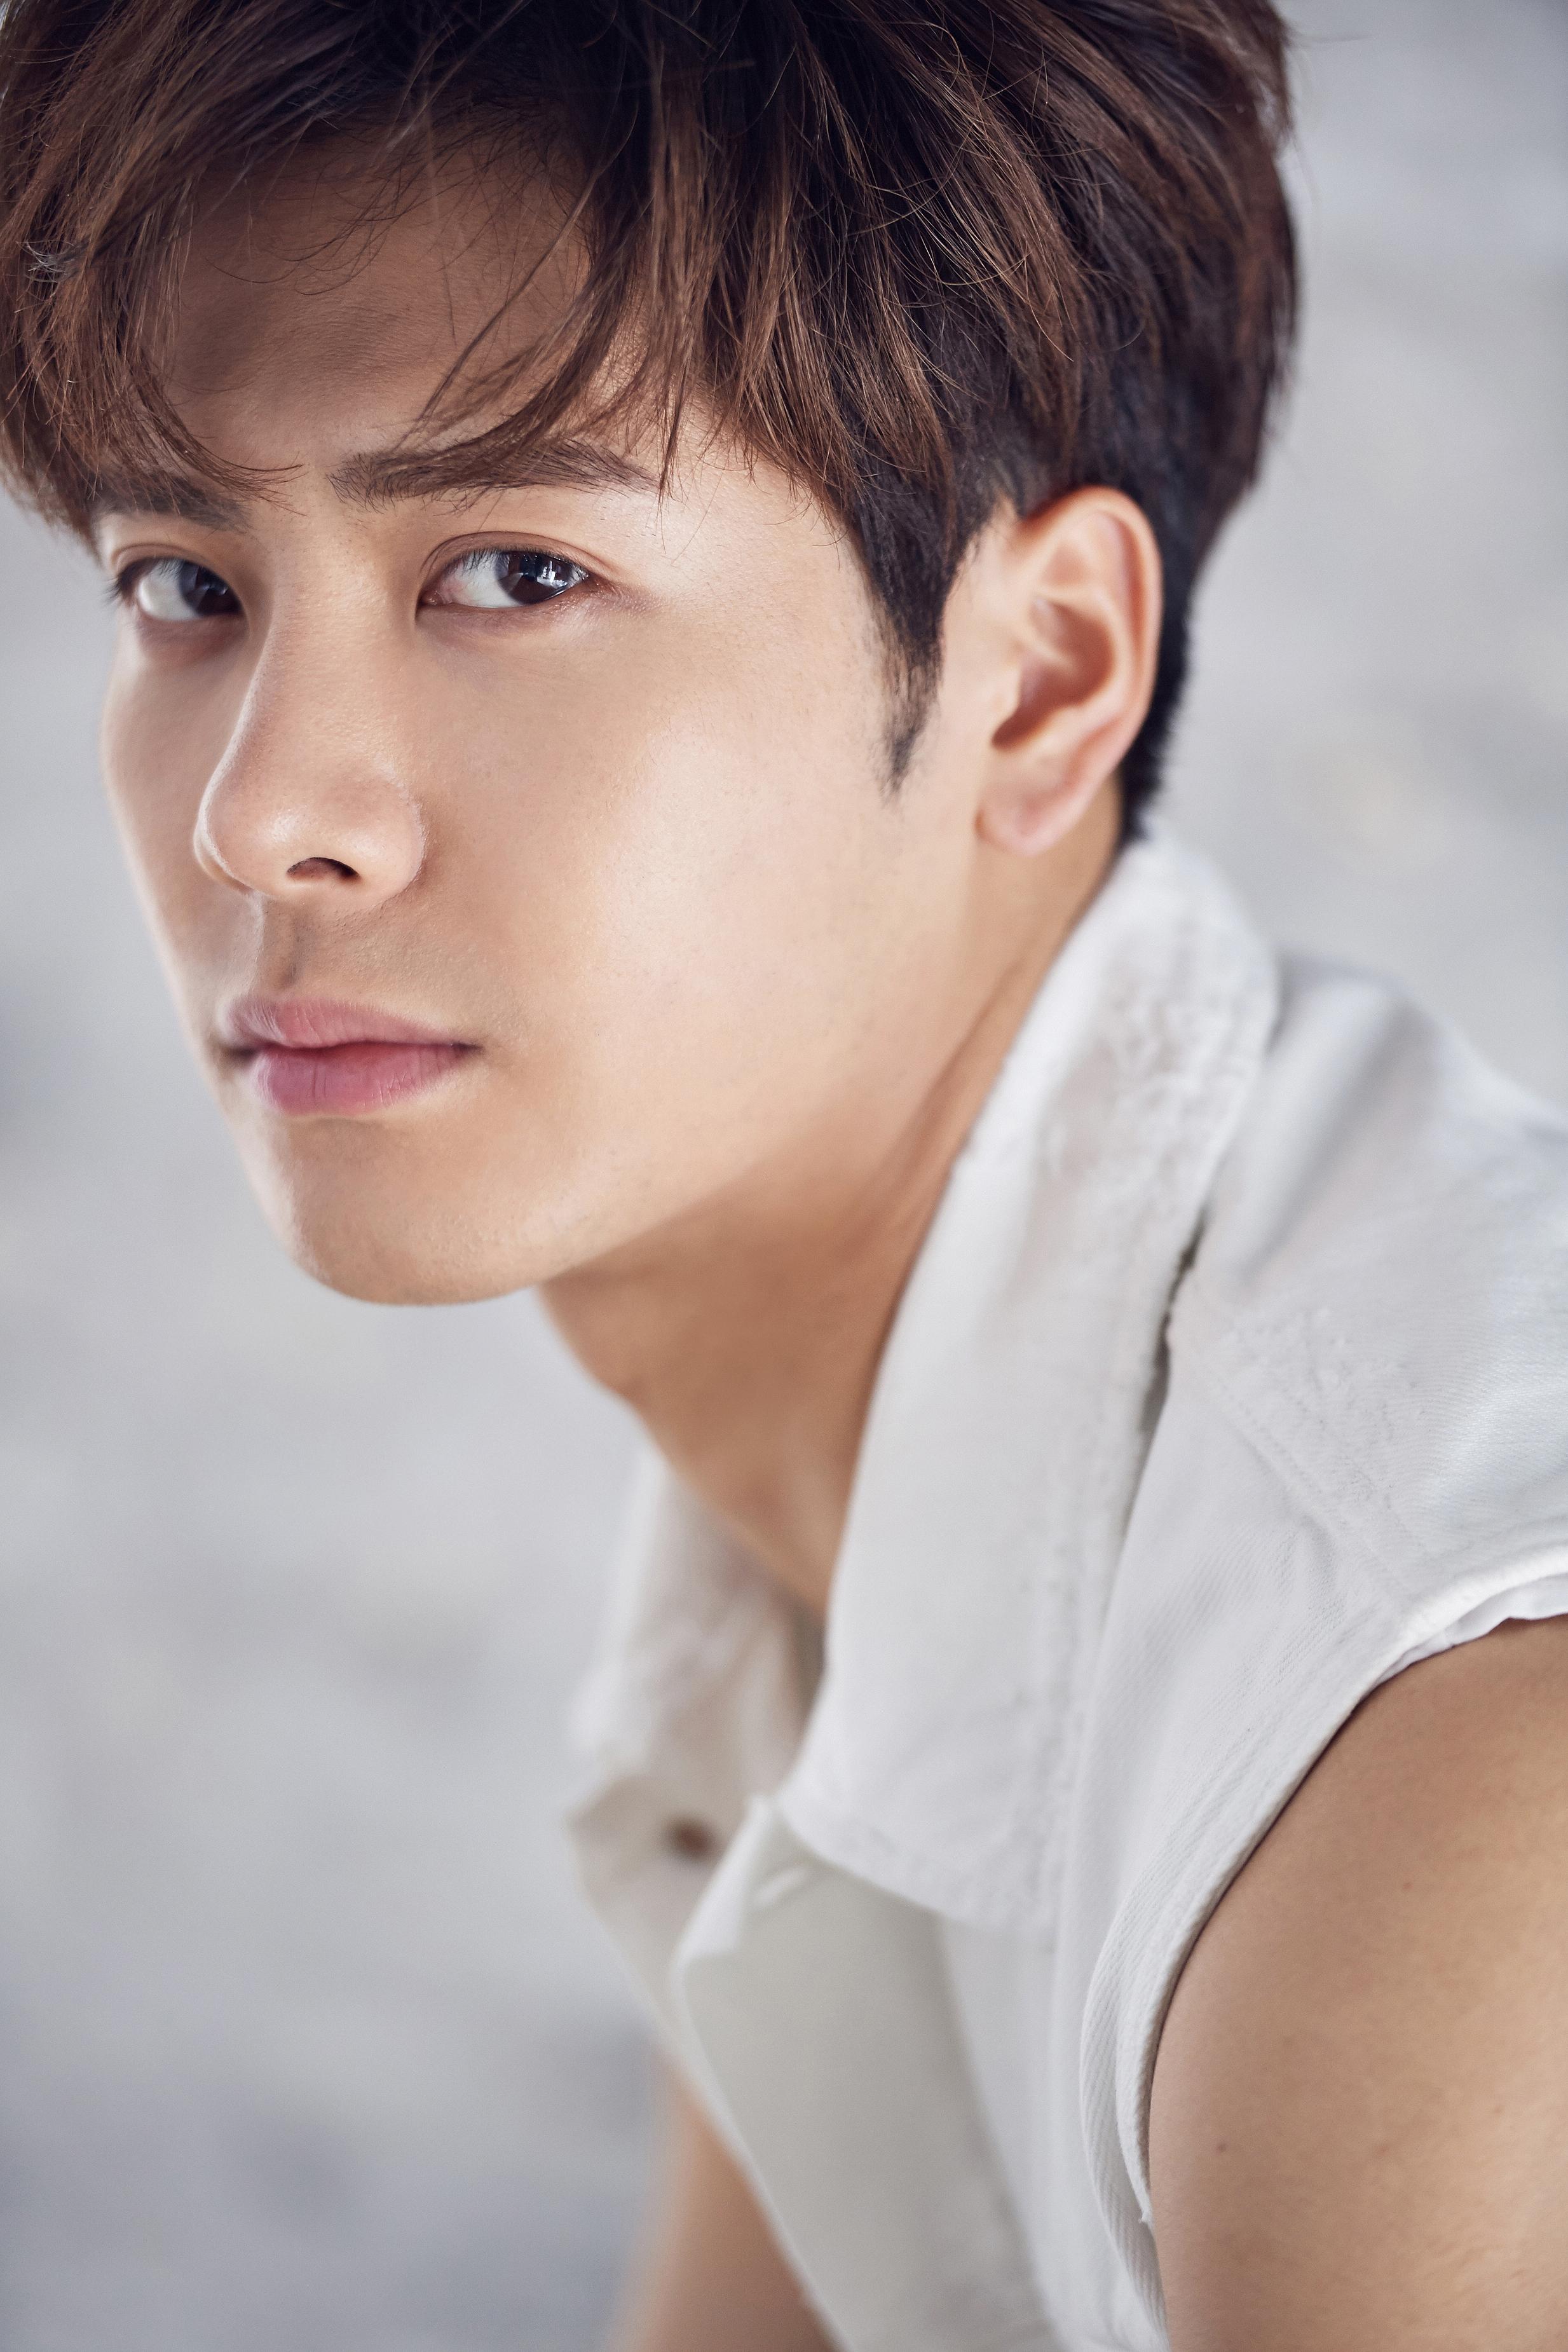 Download Wallpaper Jackson Wang Cute Hd Cikimm Com